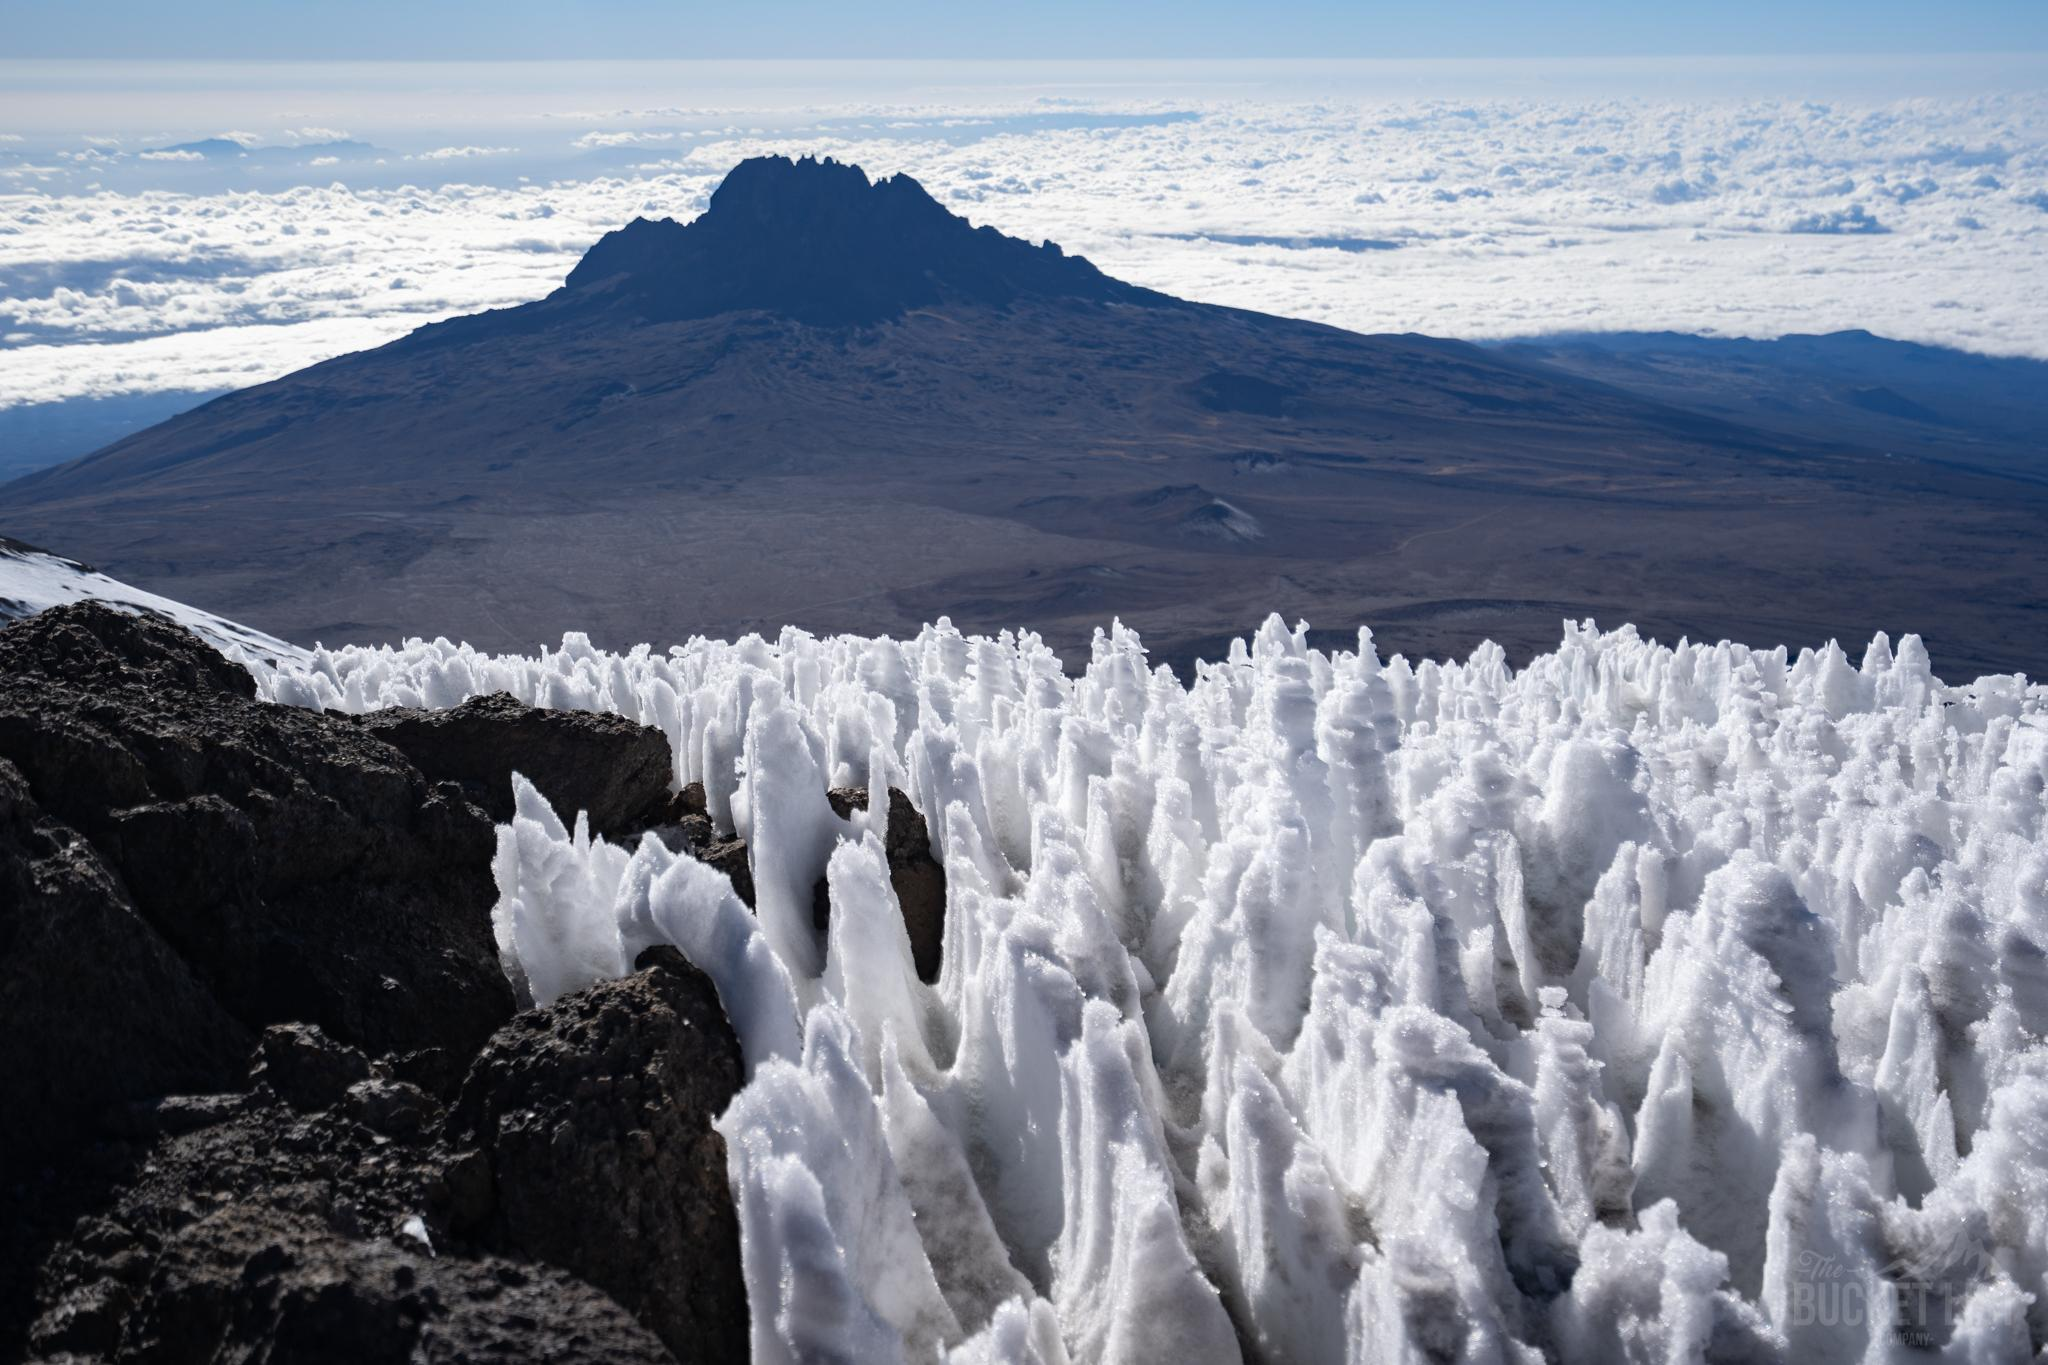 Kilimanjaro and ice fields